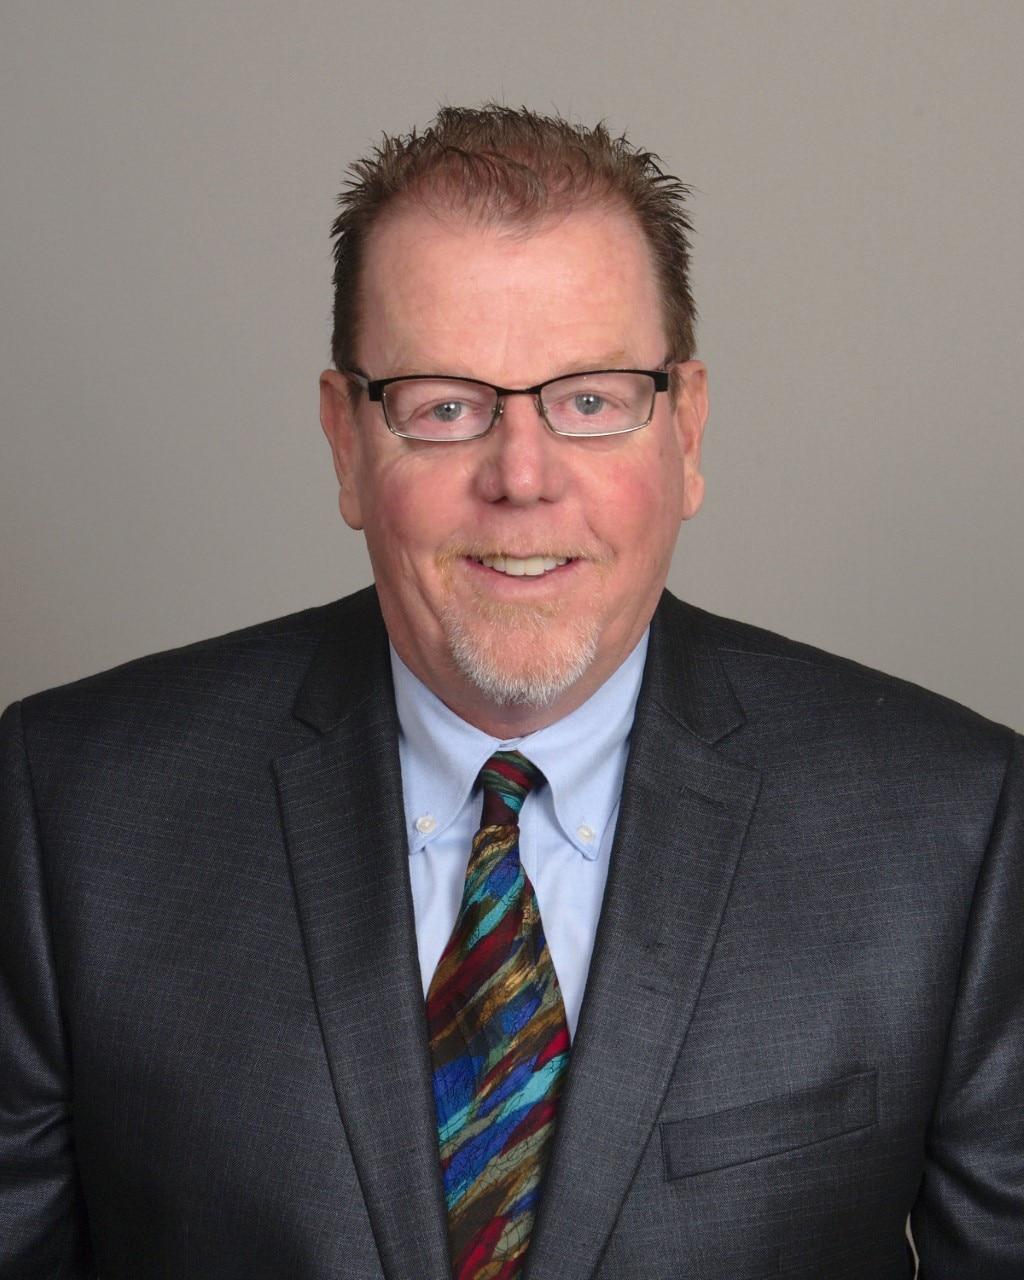 PETER M. RAUNER Financial Professional & Insurance Agent